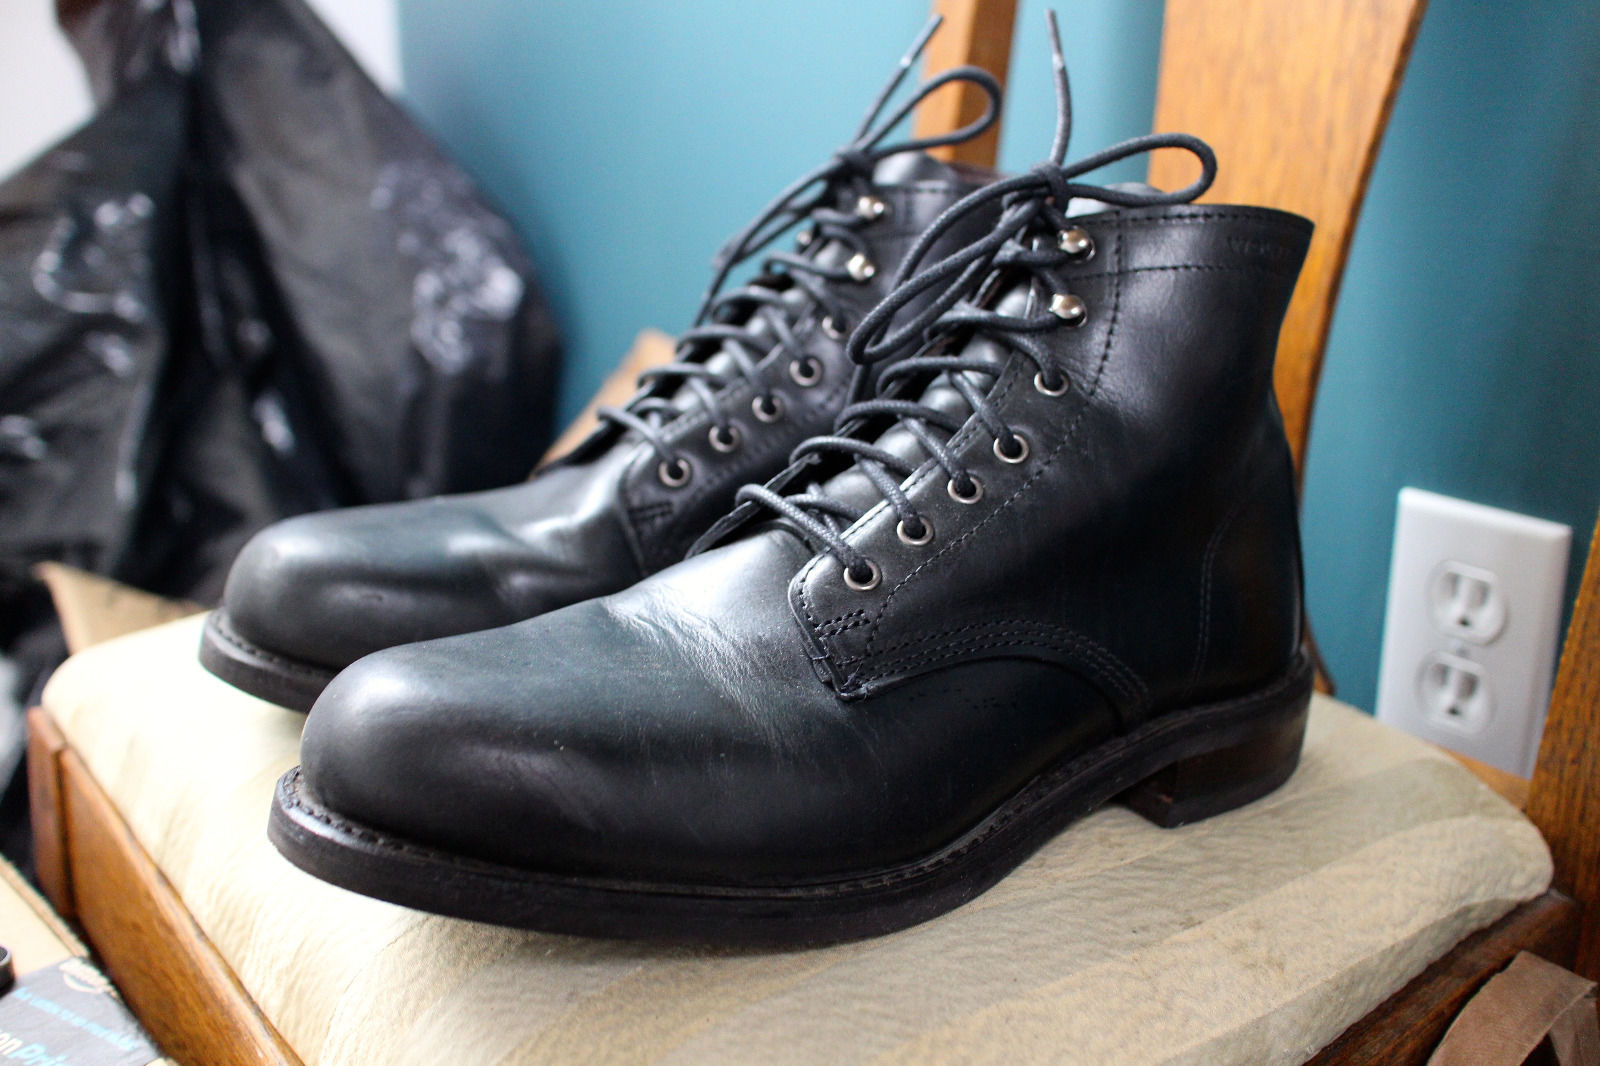 wolverine kilometer boot size 11 styleforum